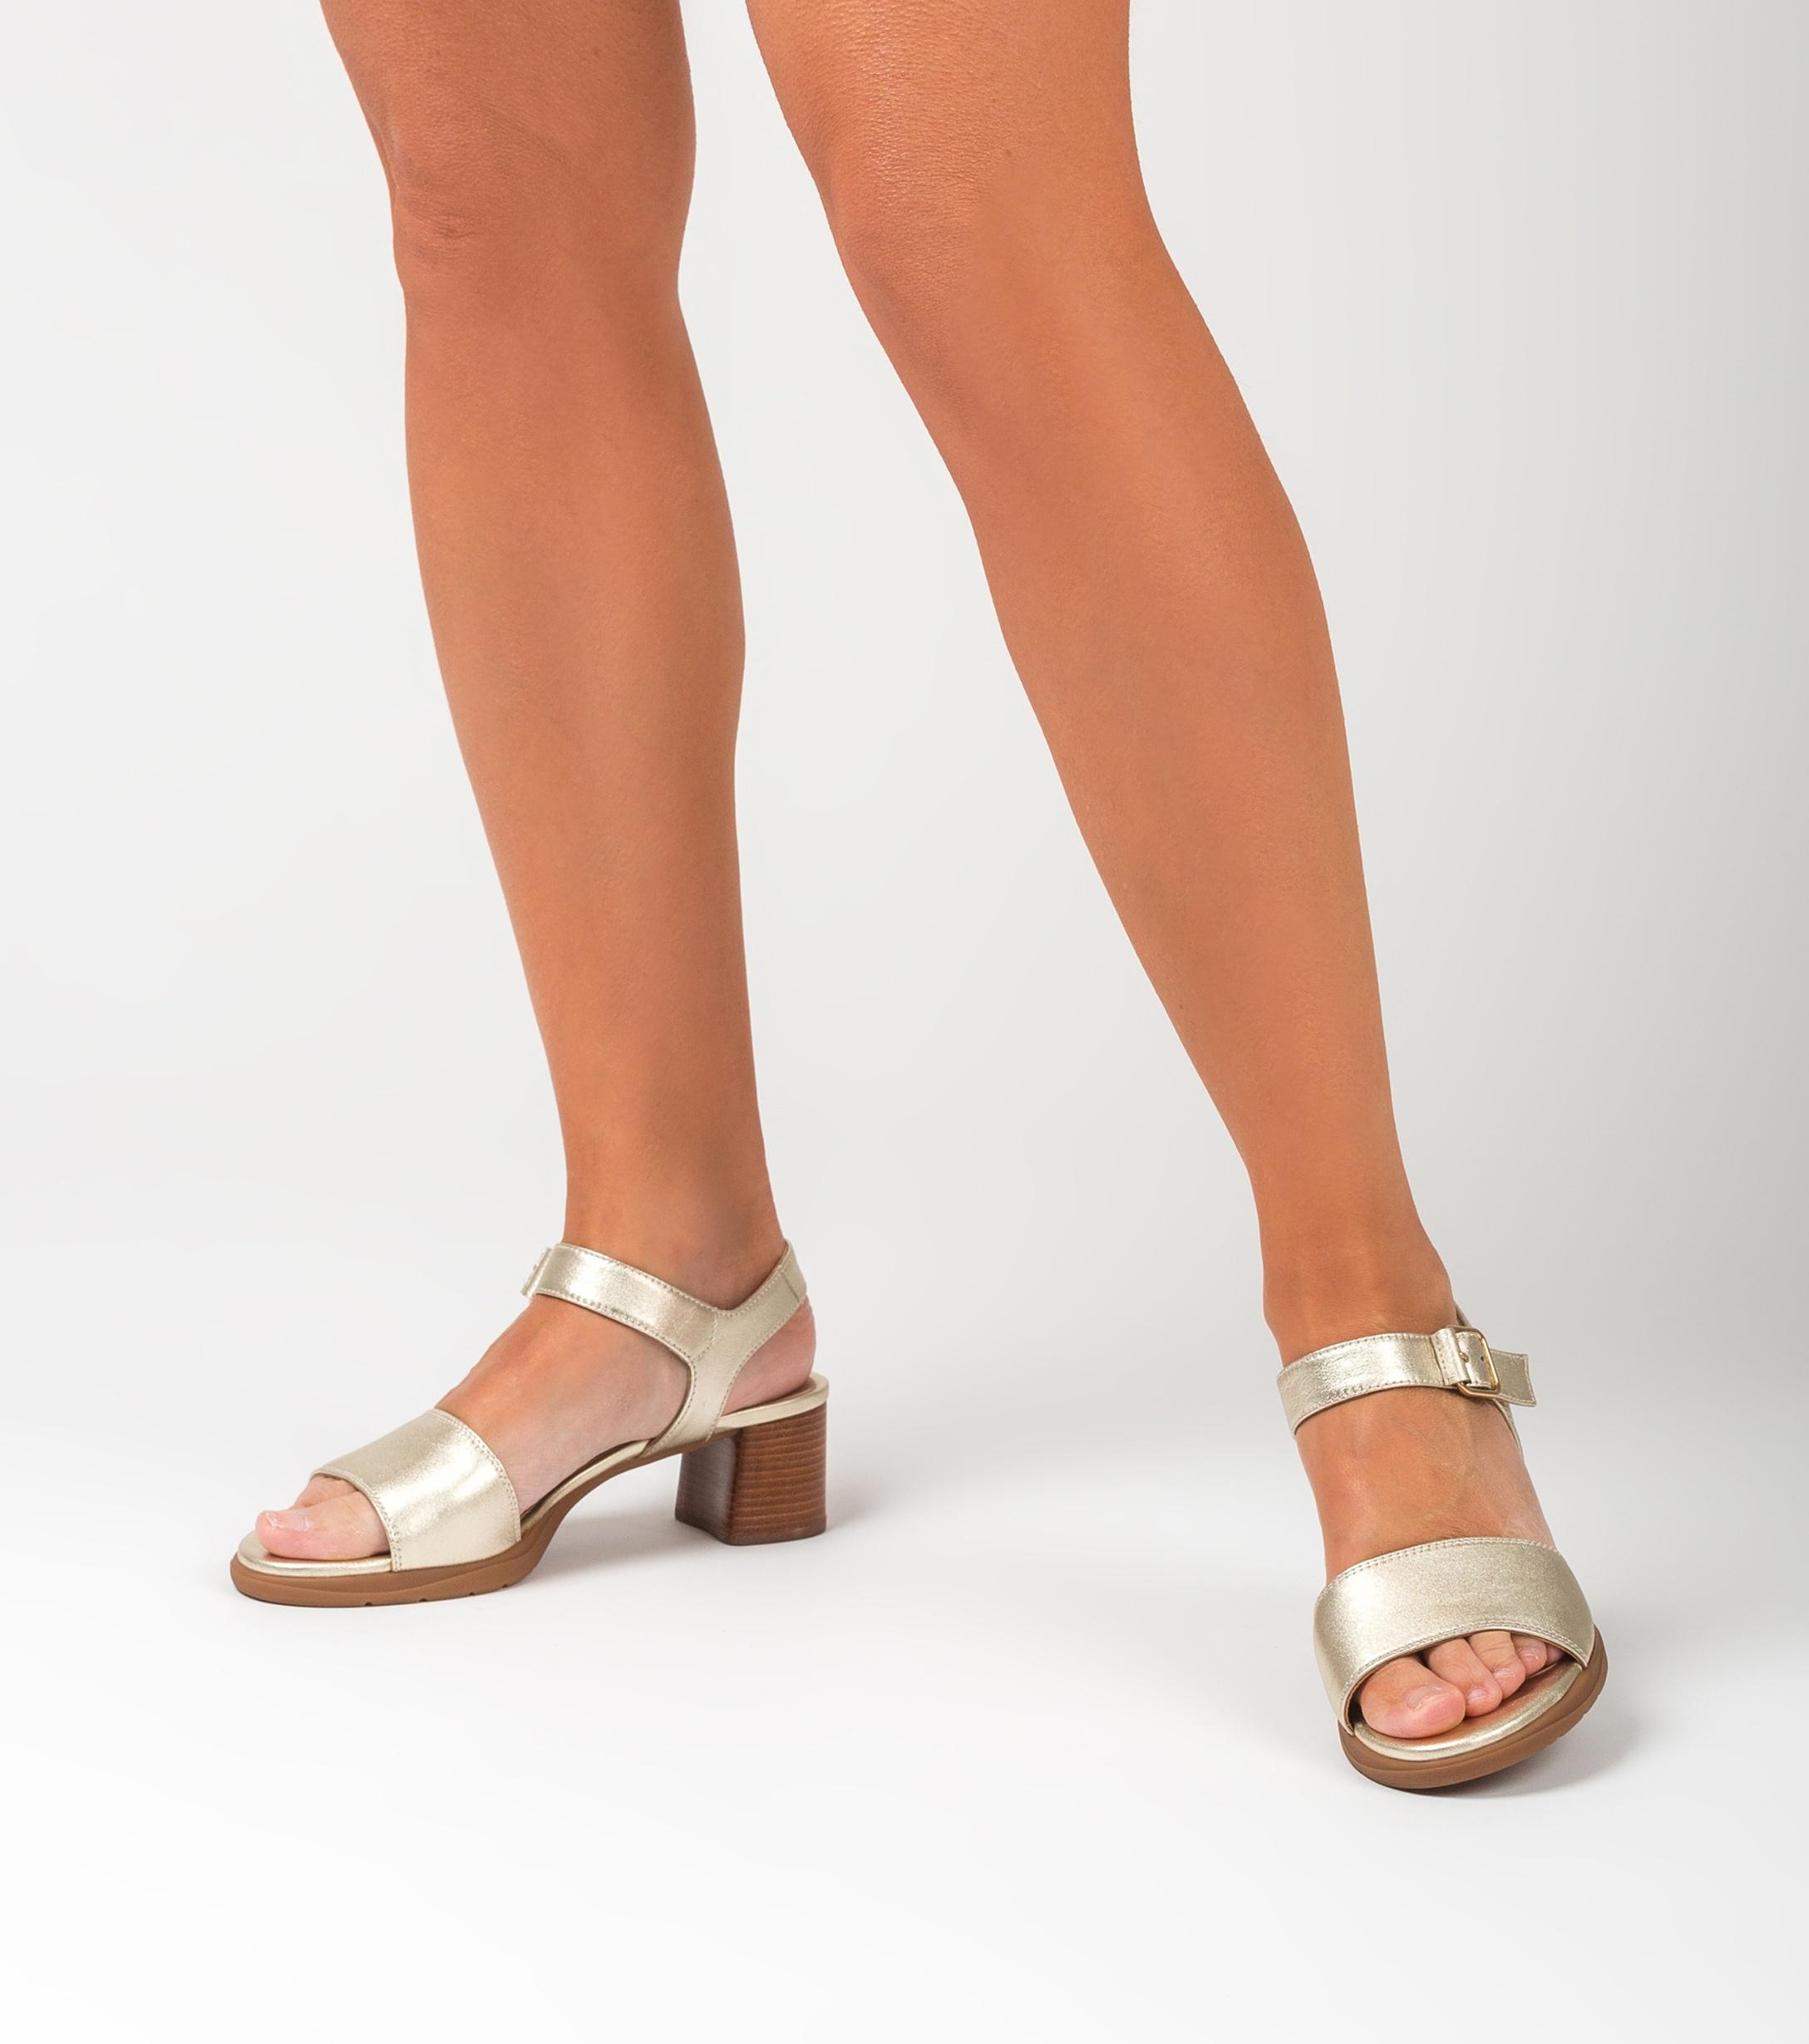 UNISA Sandale or clair talon effet bois GODOY_LMT platino 3